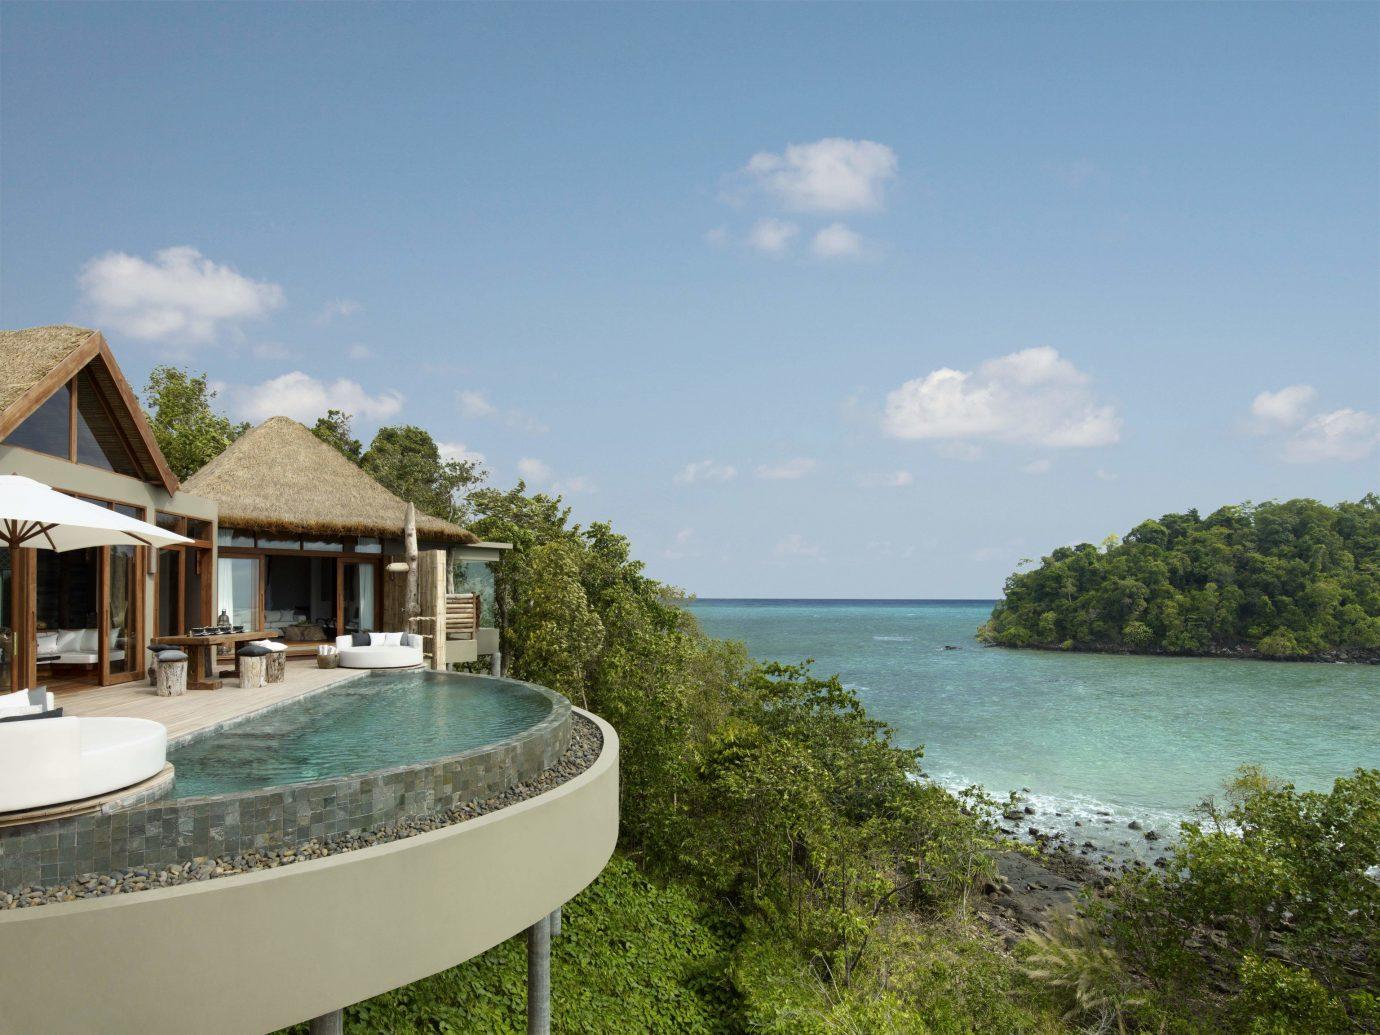 All-Inclusive Resorts Hotels Luxury Travel sky outdoor property vacation swimming pool estate Resort bay Sea Villa Lagoon caribbean shore